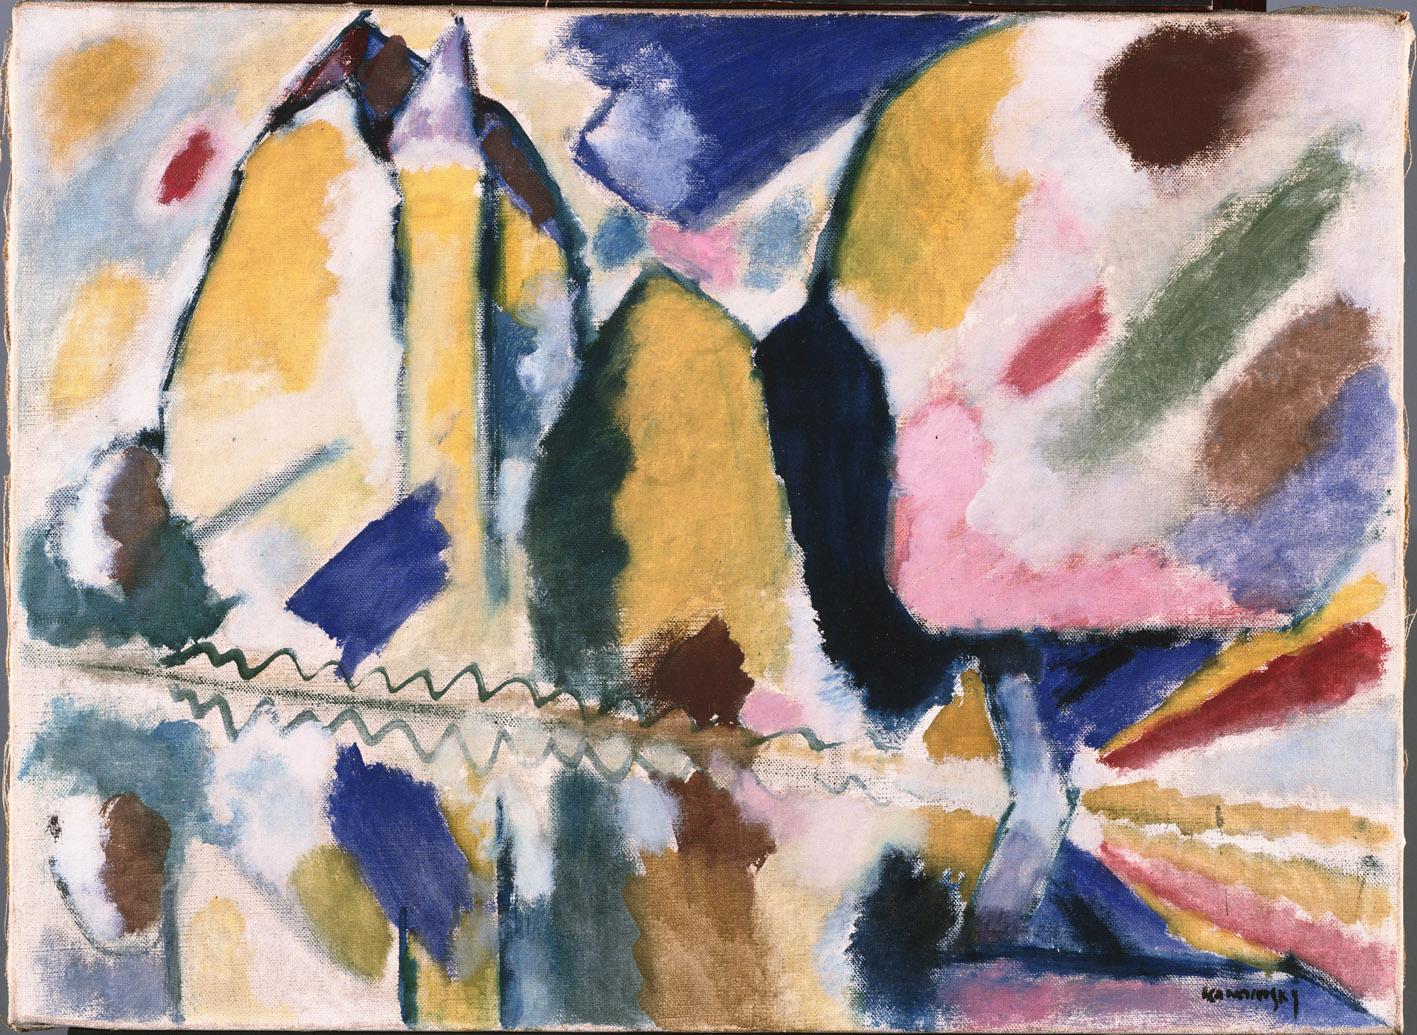 Autunno II, por Vasili Kandinski, 1912, óleo sobre lienzo, 60,6 x 82,6 cm, The Phillips Collection, Washington, D.C., adquirido en 1945.